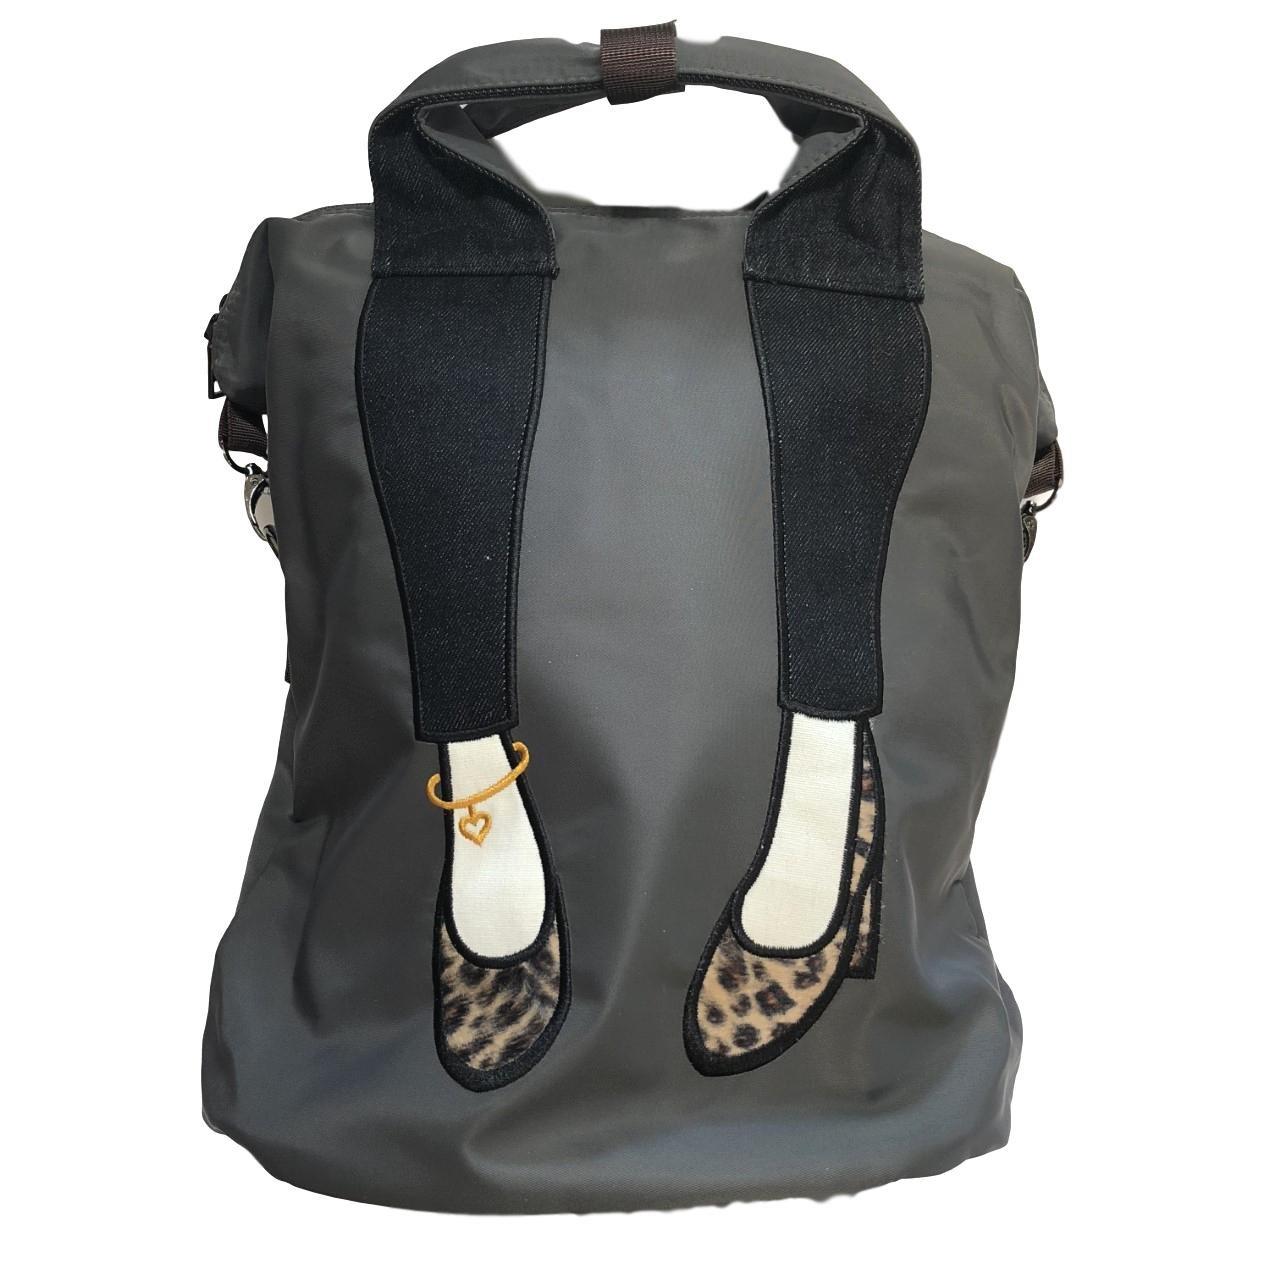 Love My Shoes Trendy Leopard Shoe Laptop Backpack Travel Bag